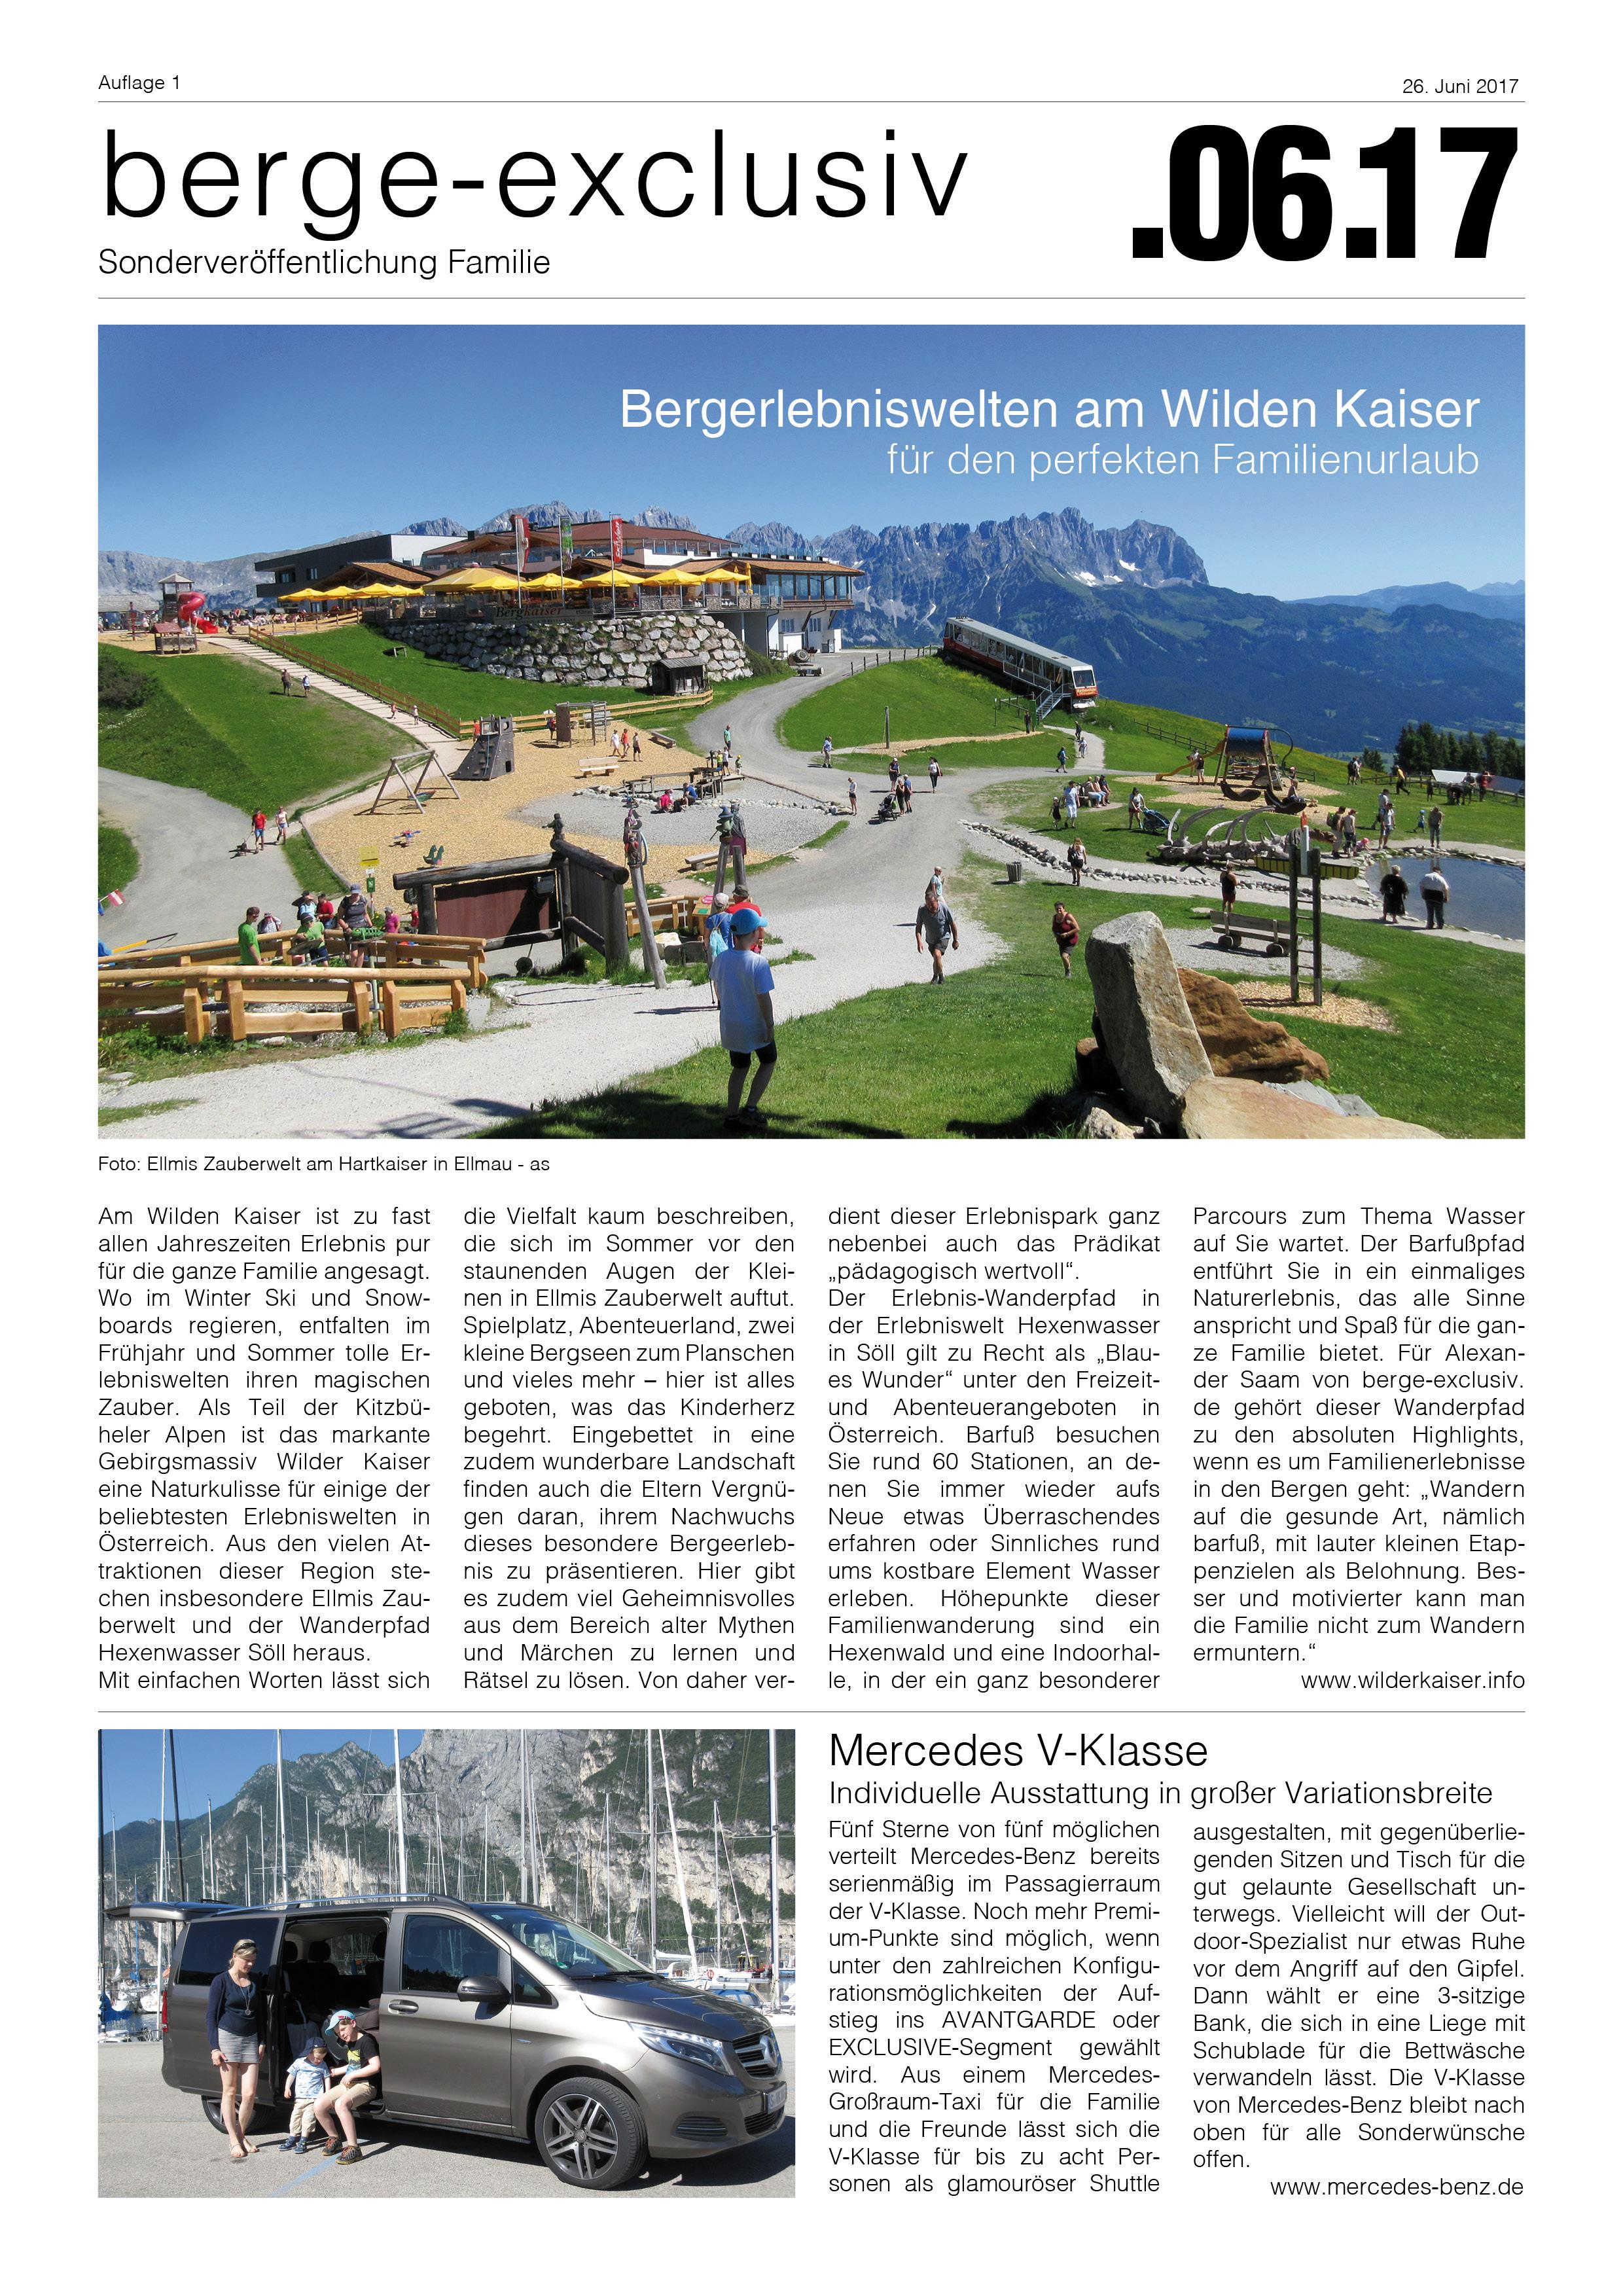 http://www.berge-exclusiv.de/wp-content/uploads/berge-ausgabe-1_6-2017.jpg